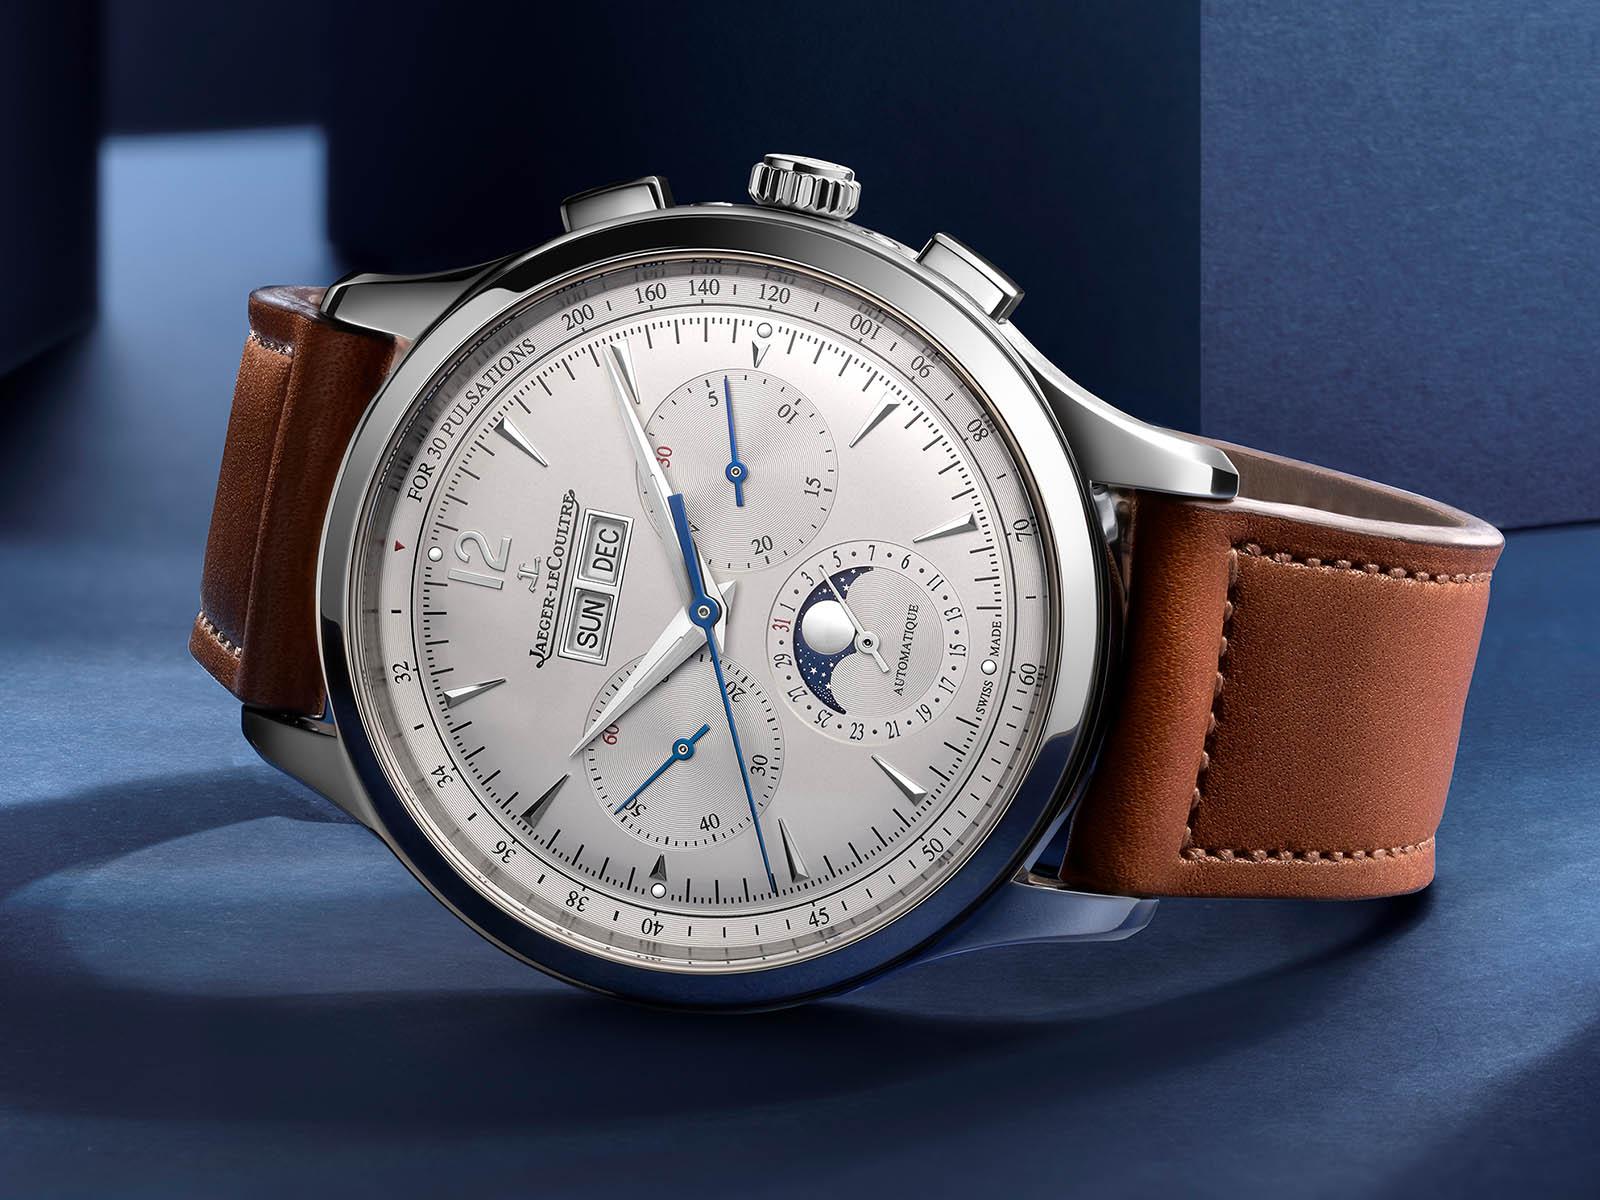 q4138420-jaeger-lecoultre-master-control-chronograph-calendar-1.jpg